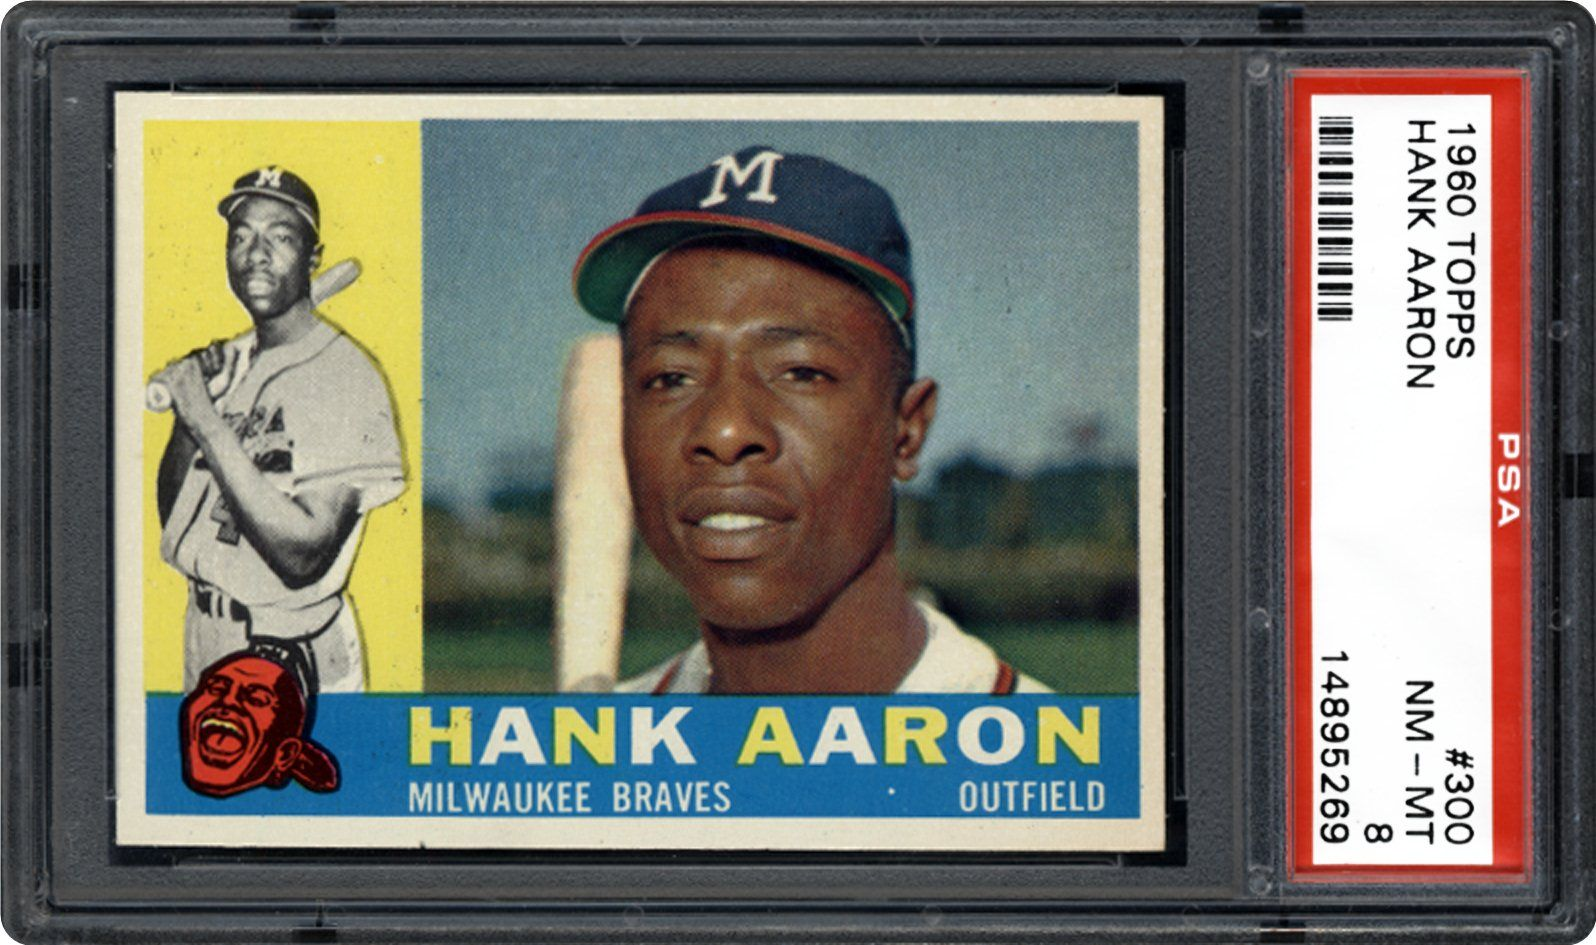 1960 Topps Hank Aaron Psa Cardfacts